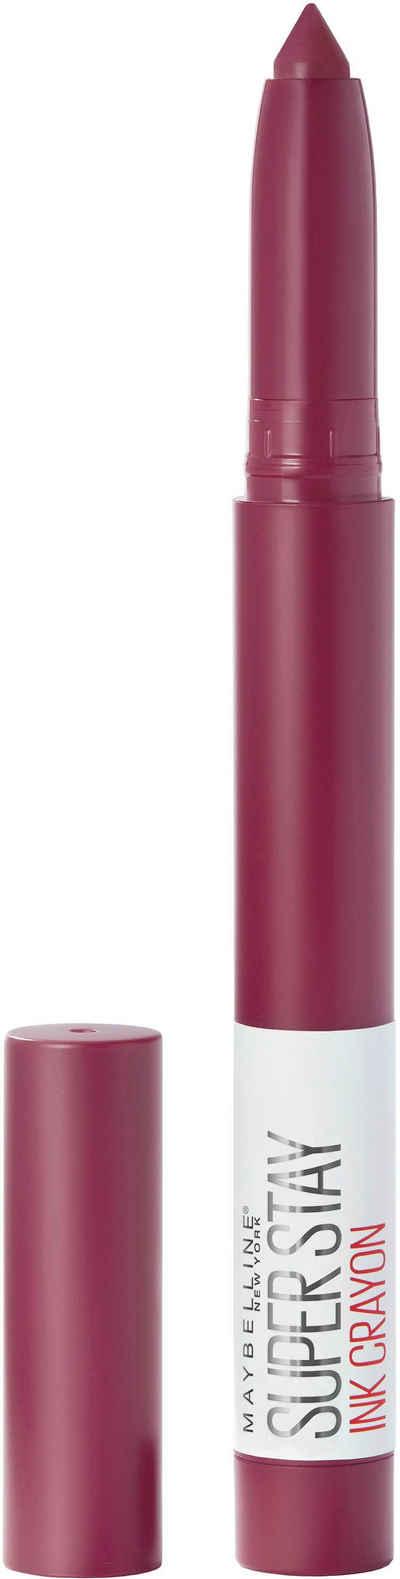 MAYBELLINE NEW YORK Lippenstift »Super Stay Ink Crayon«